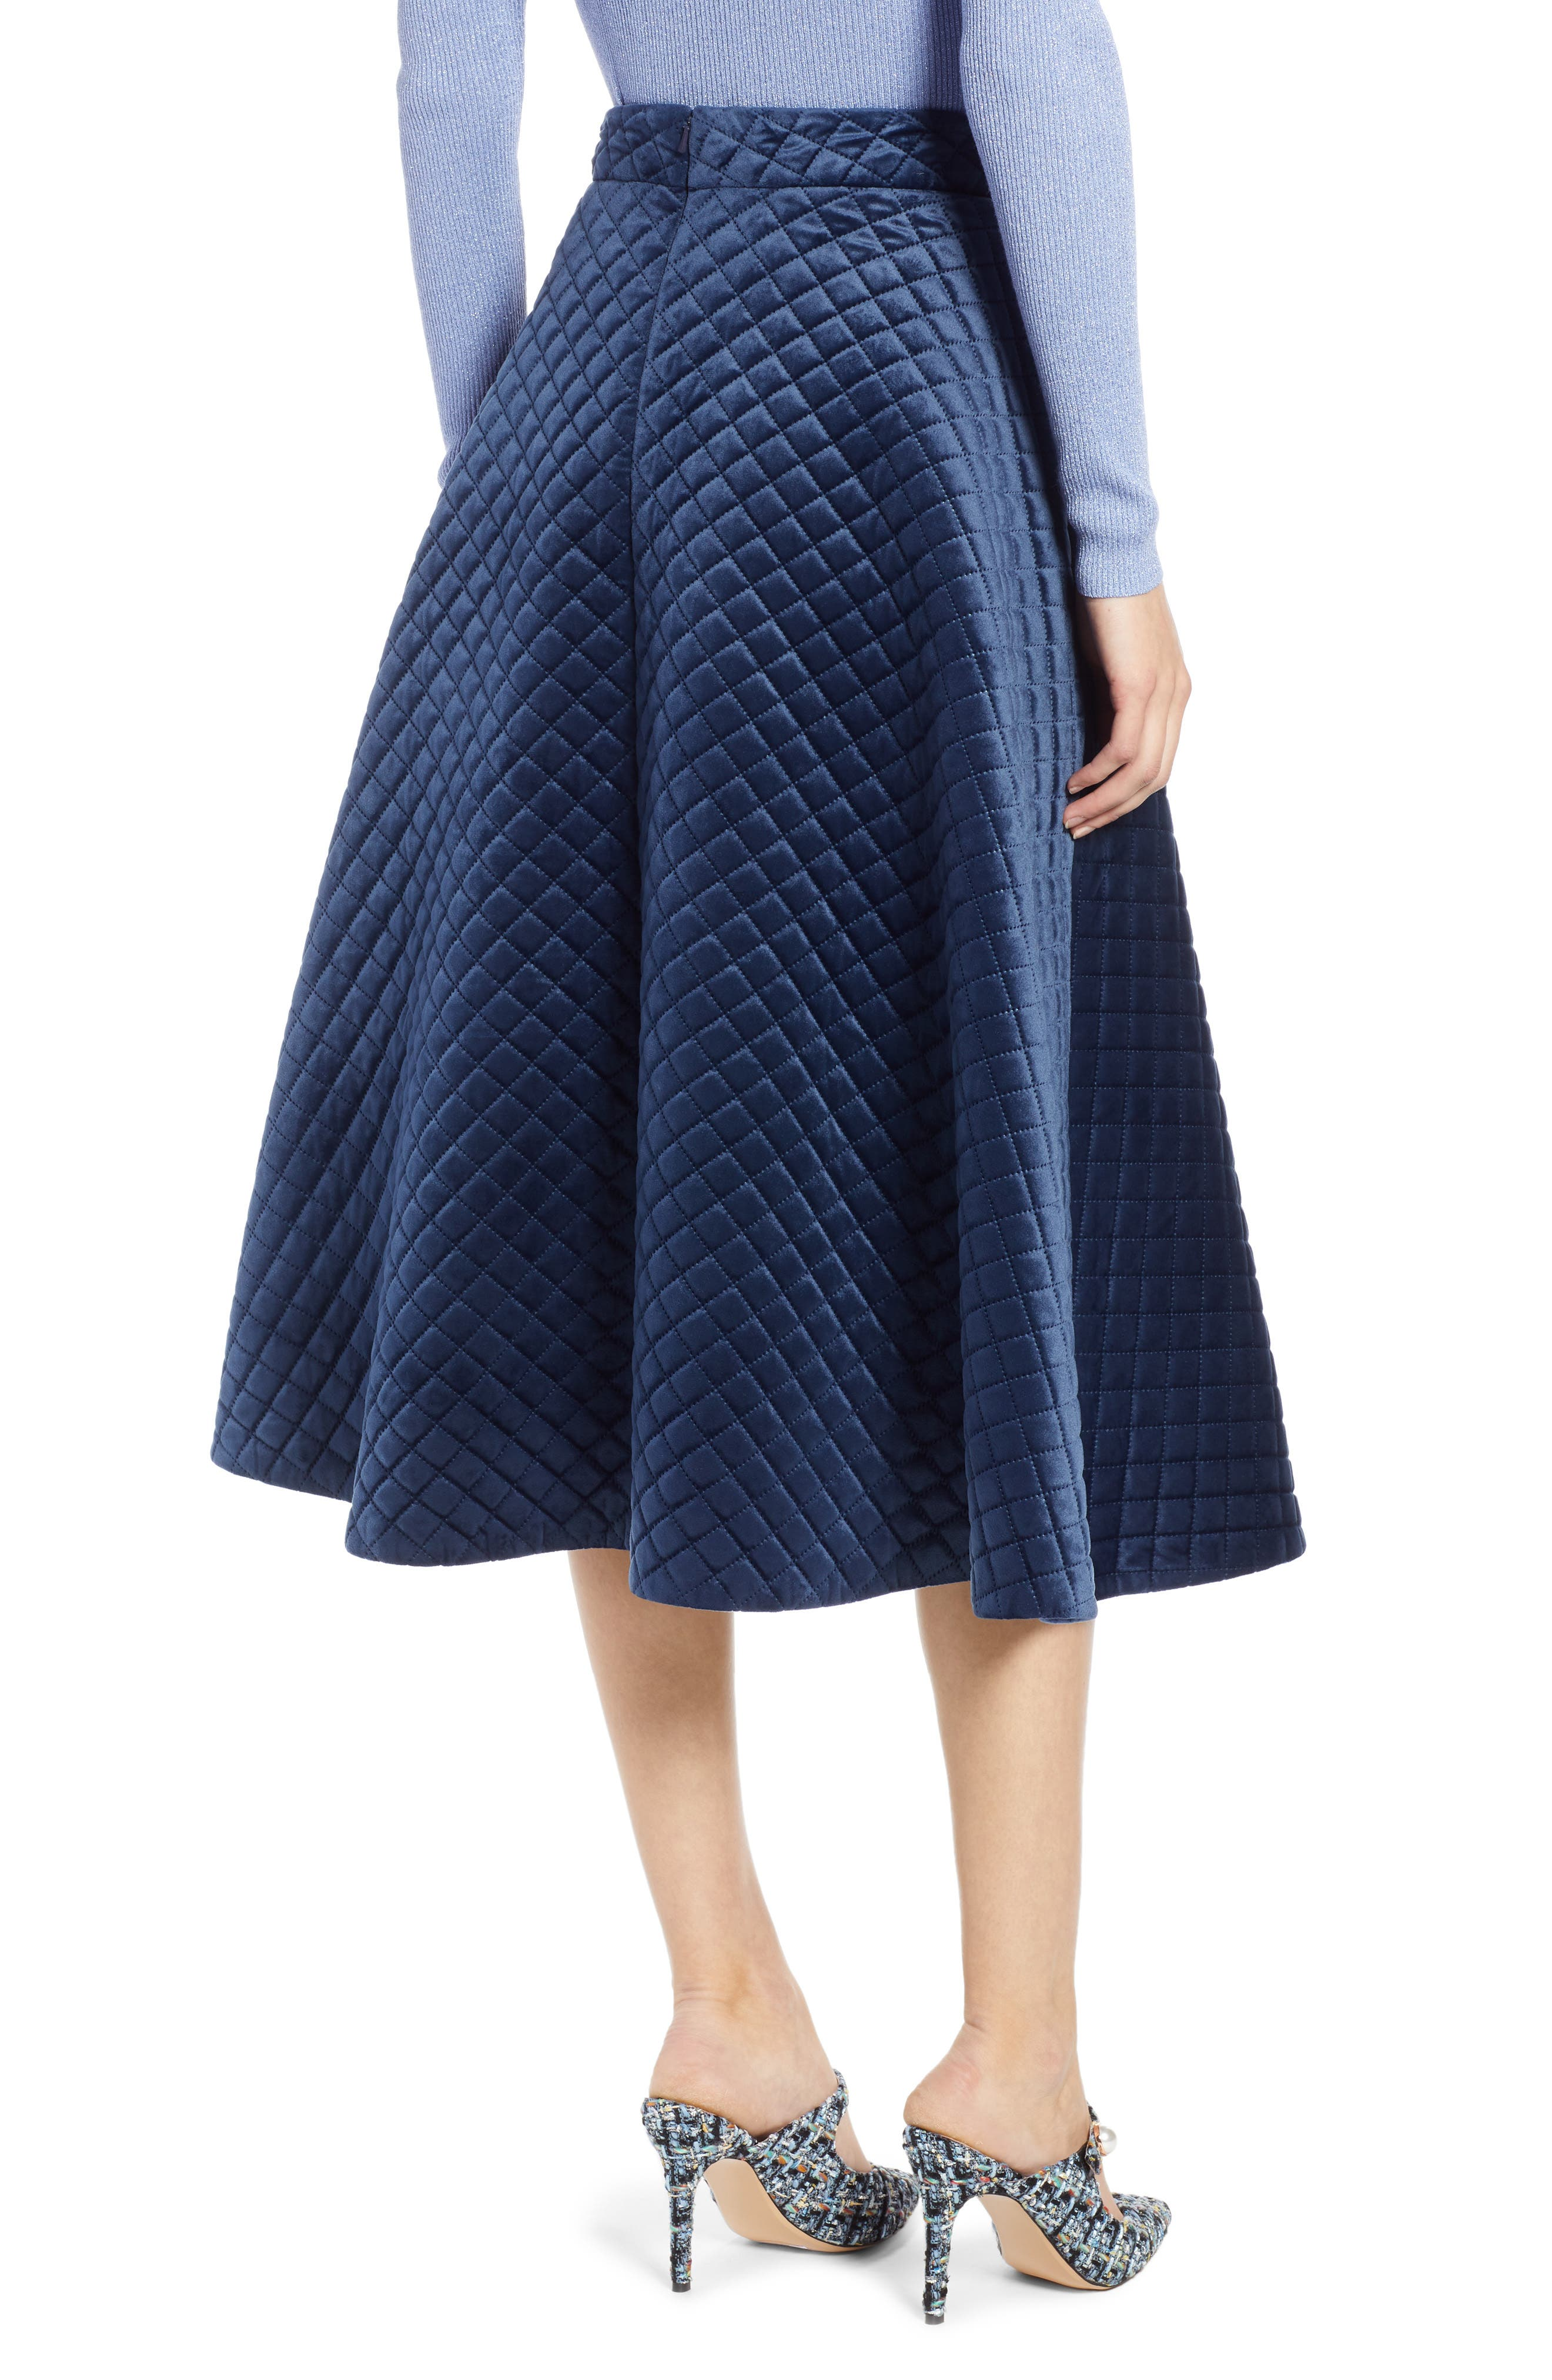 x Atlantic-Pacific Quilted Velour Circle Midi Skirt,                             Alternate thumbnail 3, color,                             NAVY BLAZER